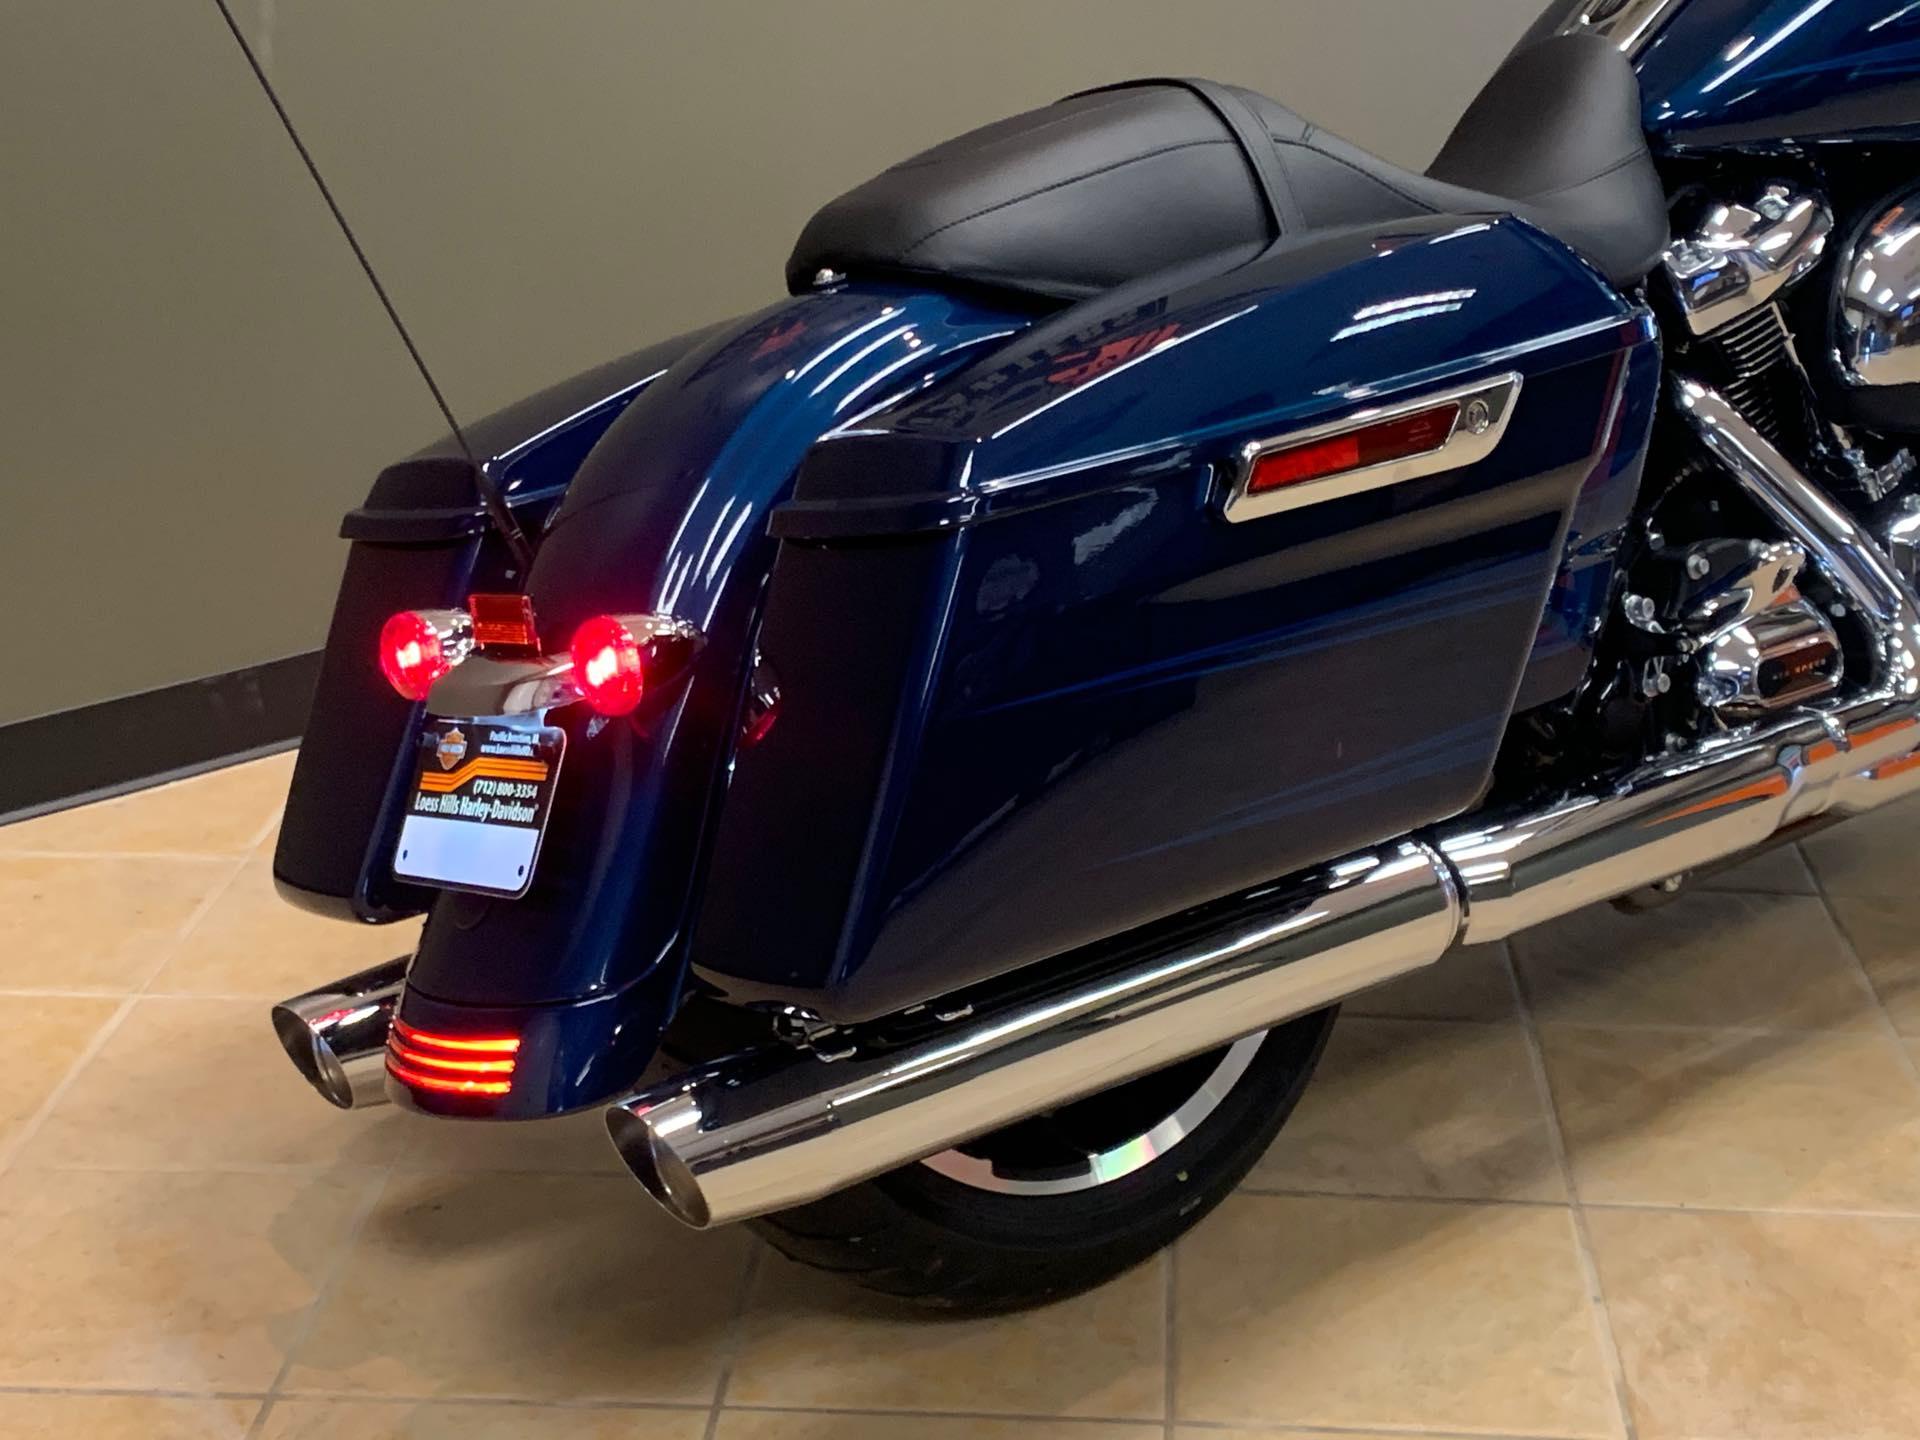 2020 Harley-Davidson Touring Road Glide at Loess Hills Harley-Davidson